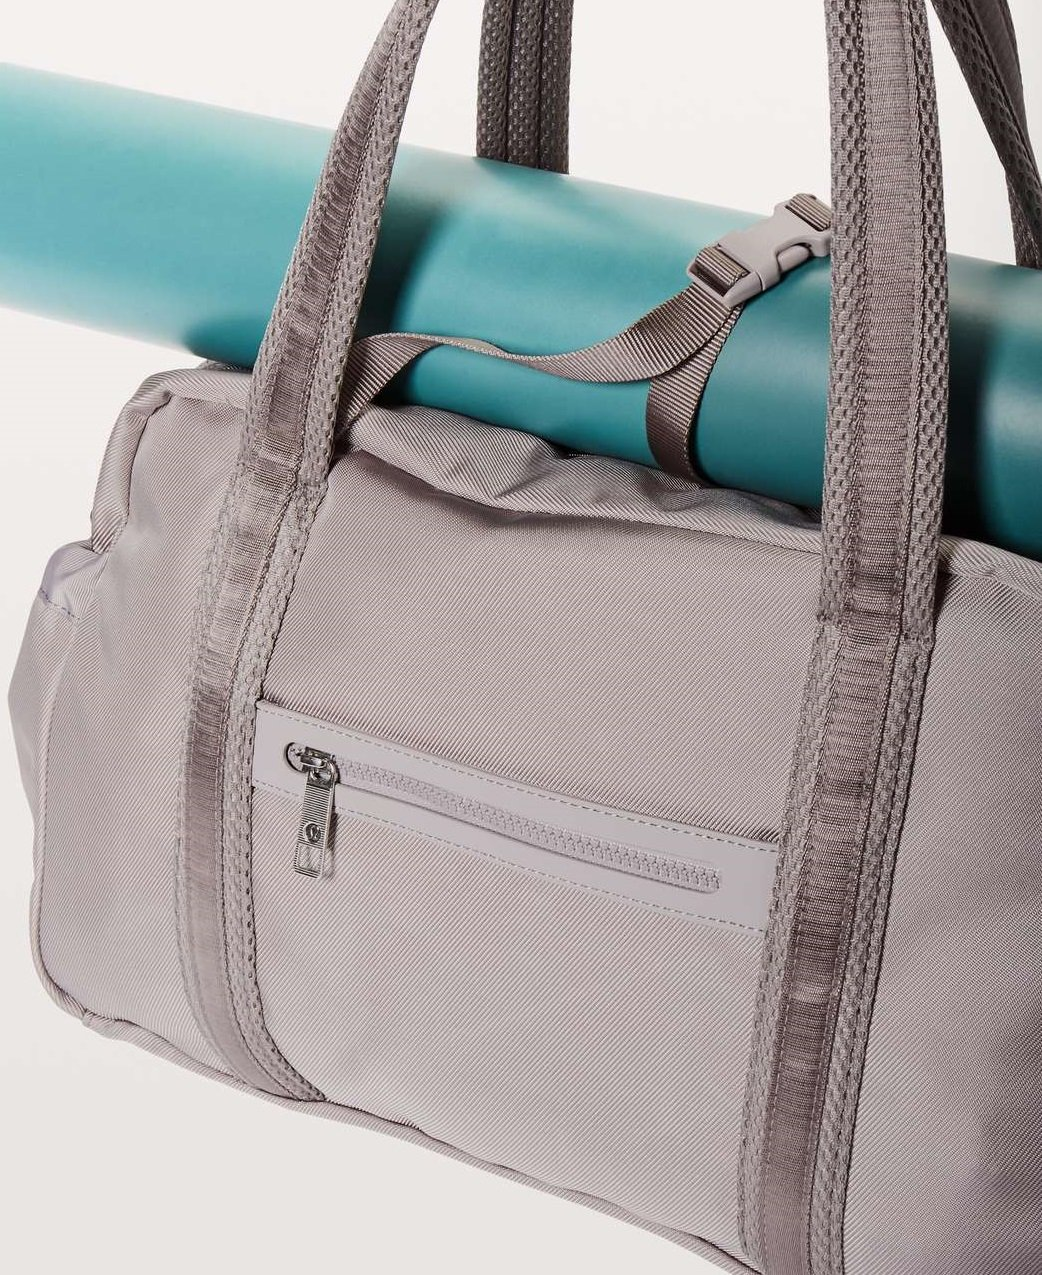 Lululemon Everywhere Duffel Bag (Dark Chrome)